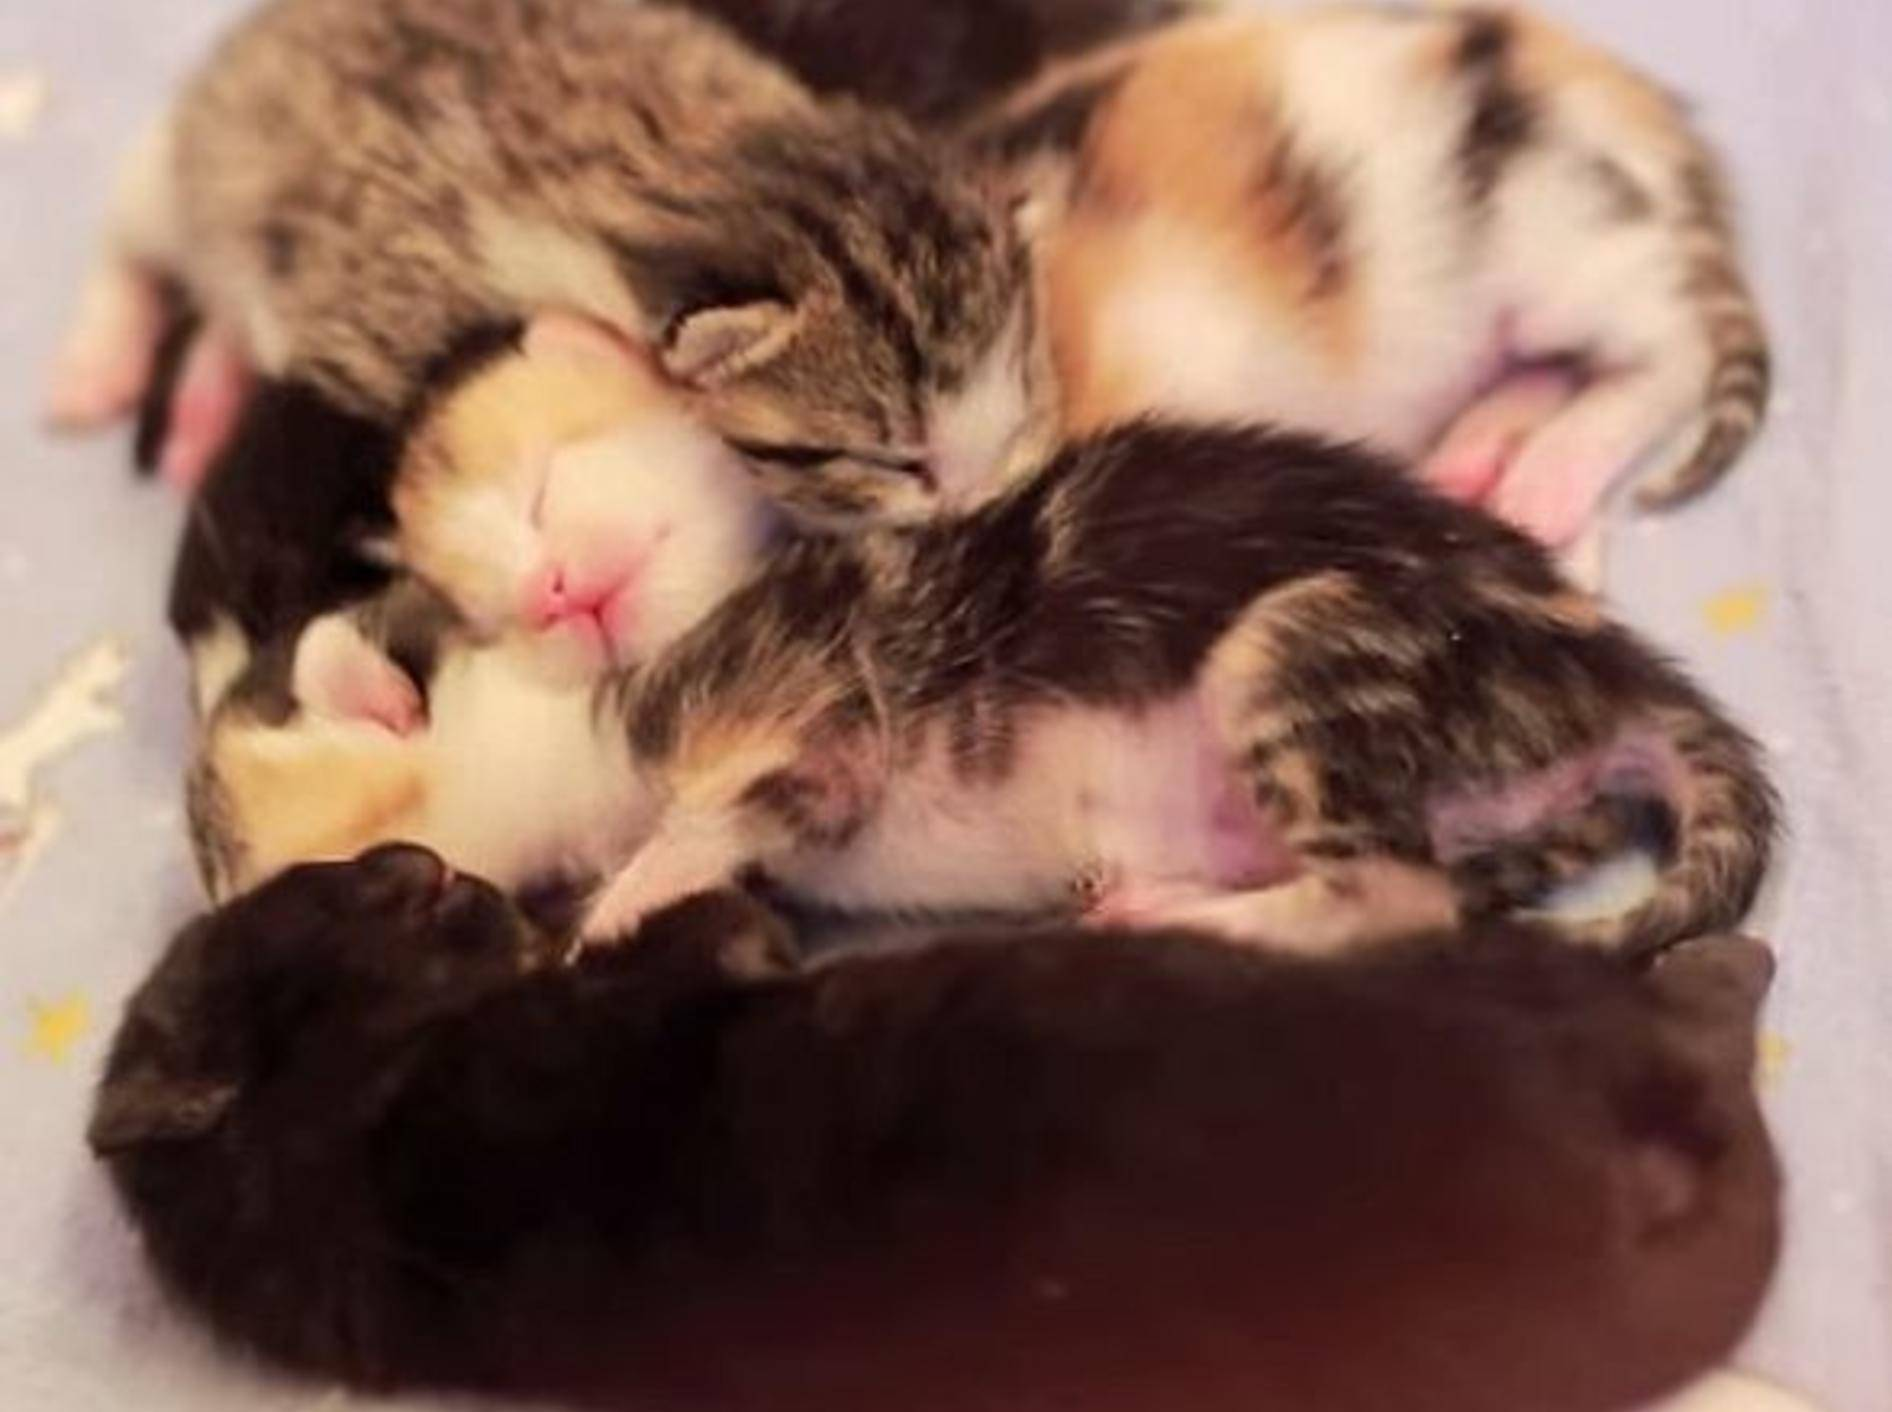 Katzenpflegestation zeigt süße Neuzugänge – Bild: Youtube / CARE - Cat Adoption & Rescue Efforts, Inc